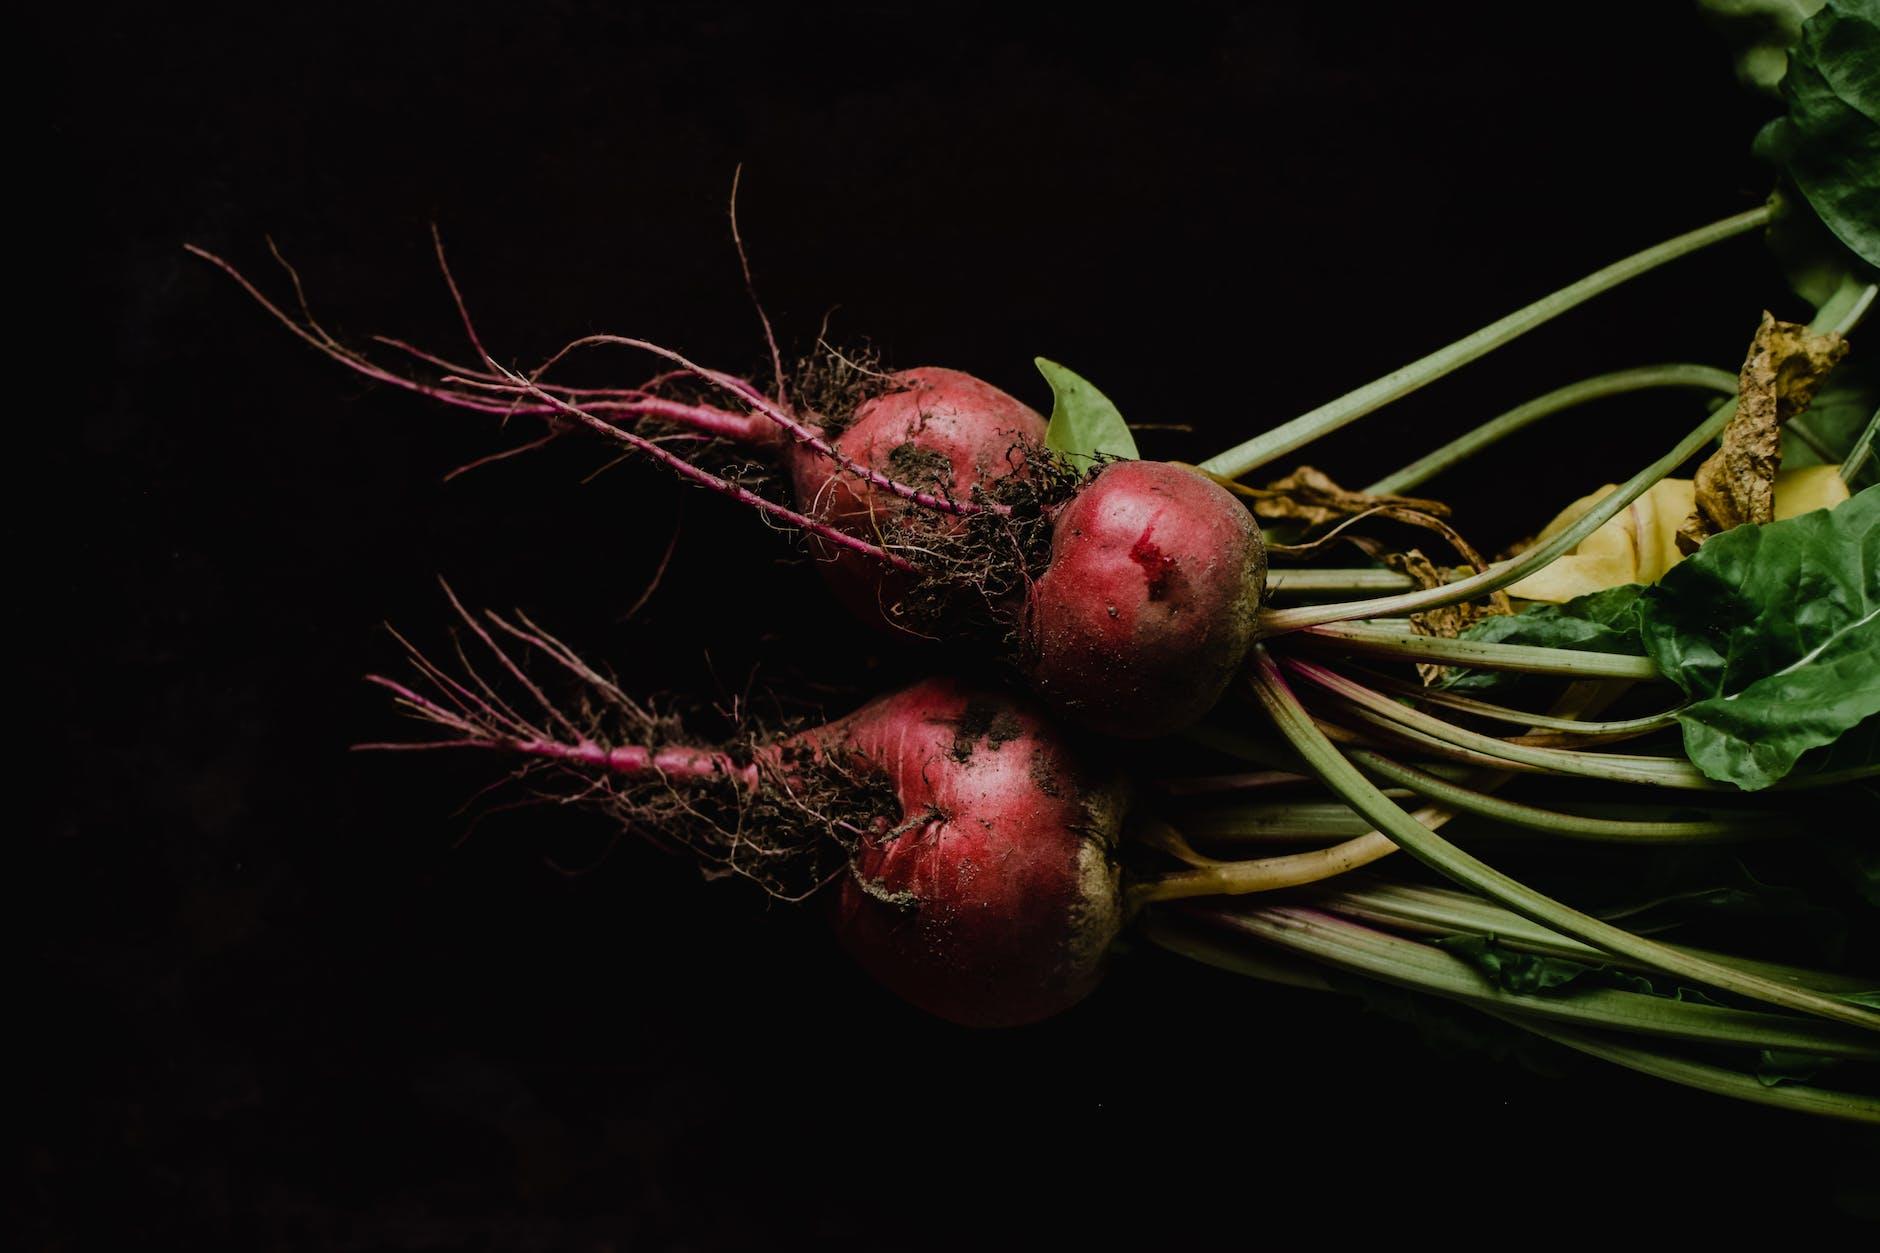 manfaat sayuran hijau stabilkan imun tubuh